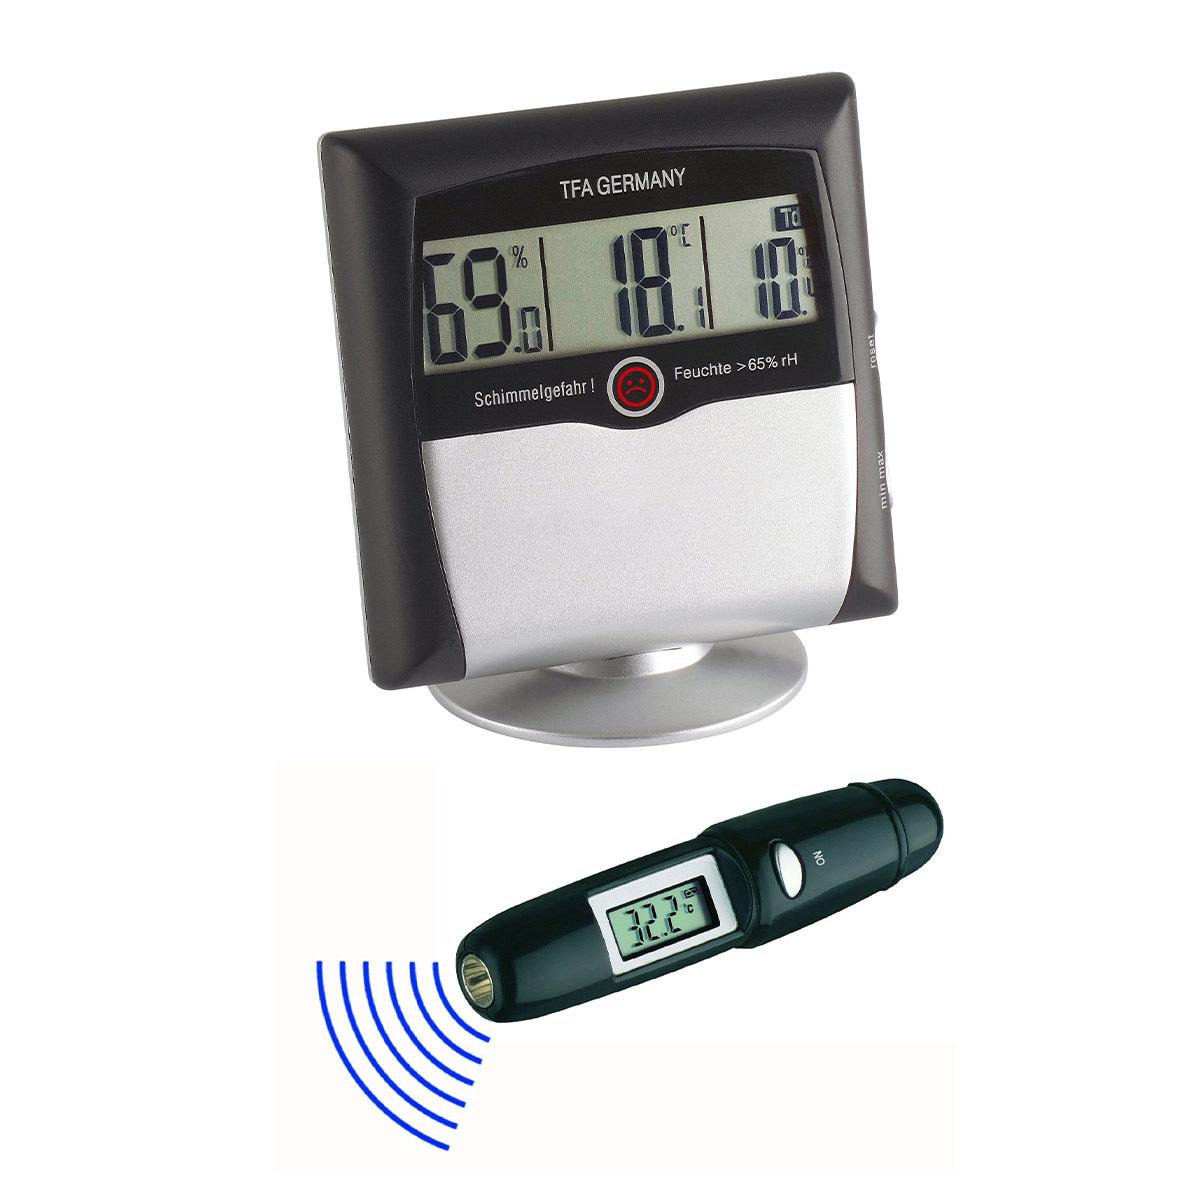 95-2008-digitales-thermo-hygrometer-mit-infrarotthermometer-klima-control-set-1200x1200px.jpg